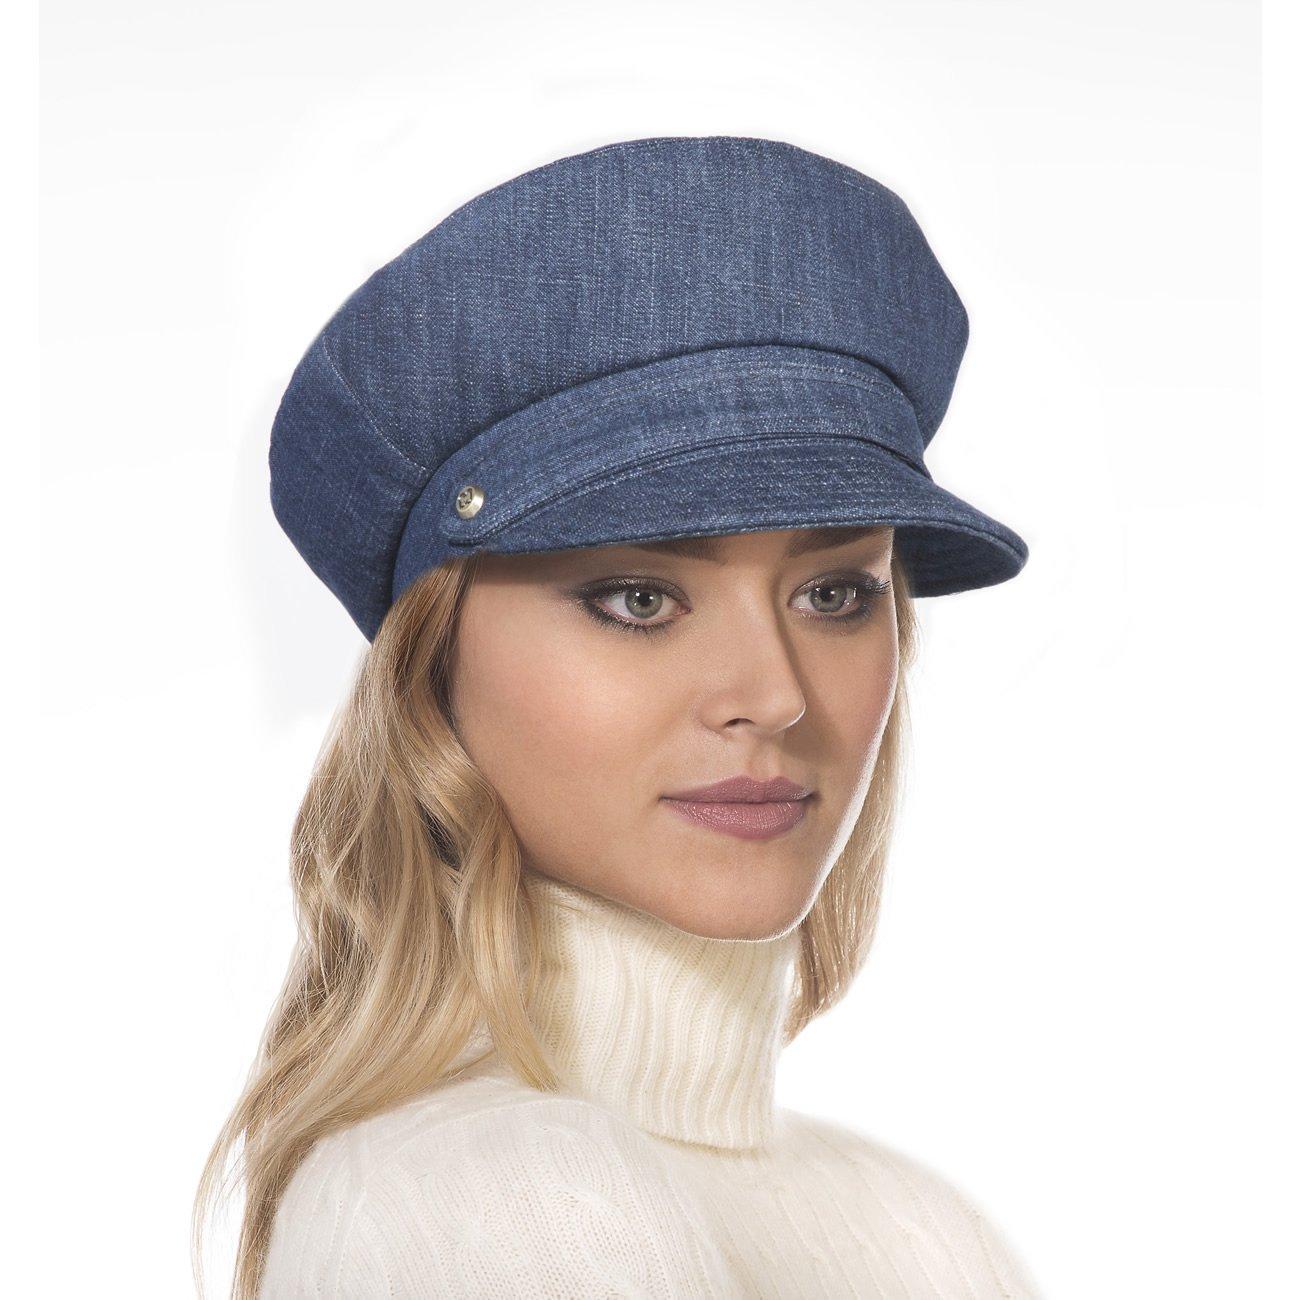 Eric Javits Luxury Fashion Designer Women's Headwear Hat - Denim Cap - Indigo